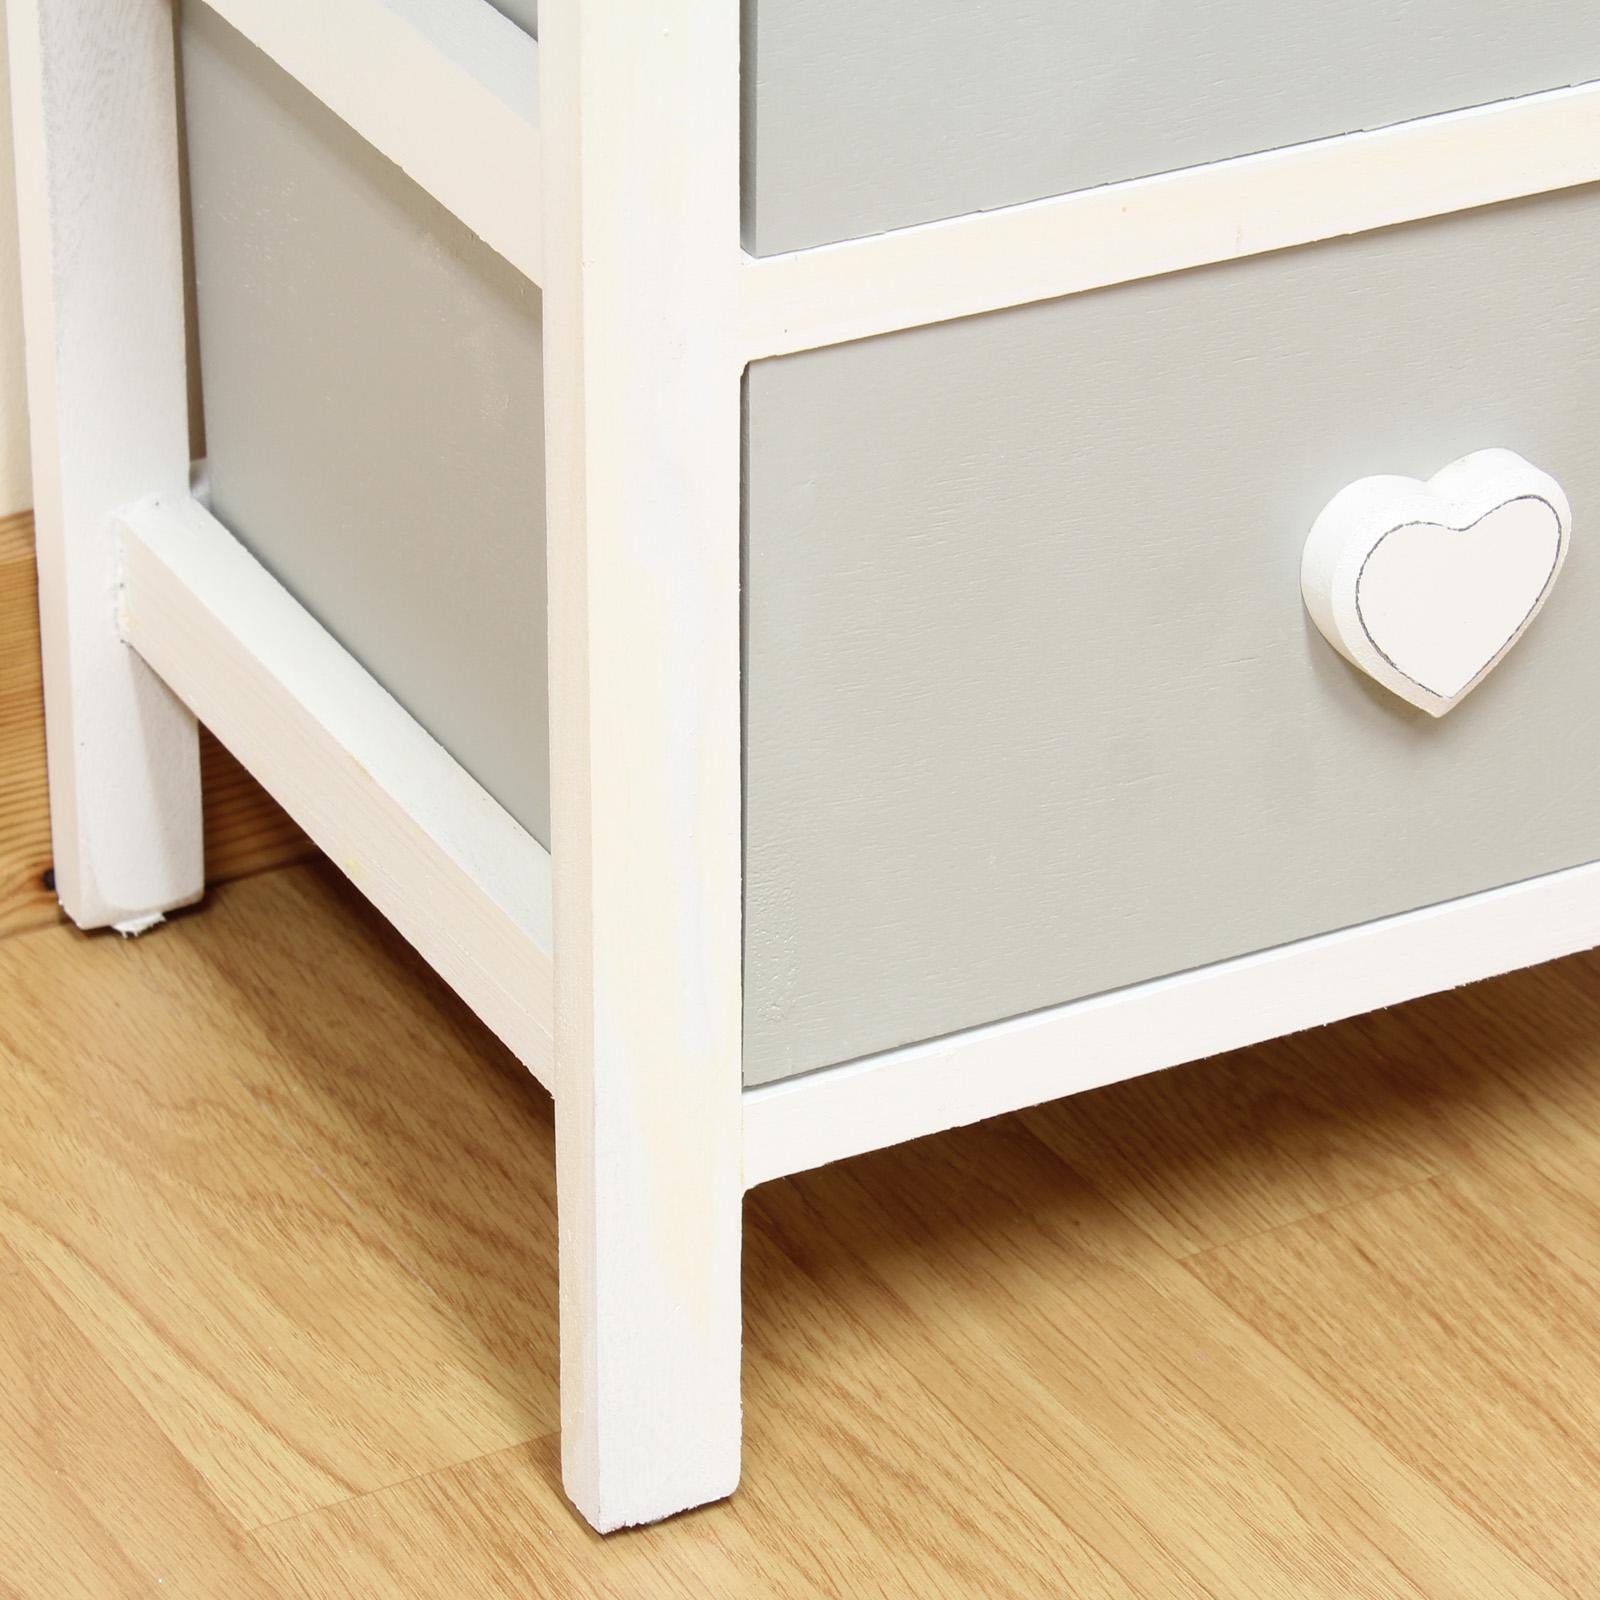 Tallboy Bedroom Furniture White Amp Grey Wooden Cabinet For Girls Bedroom Furniture Chest